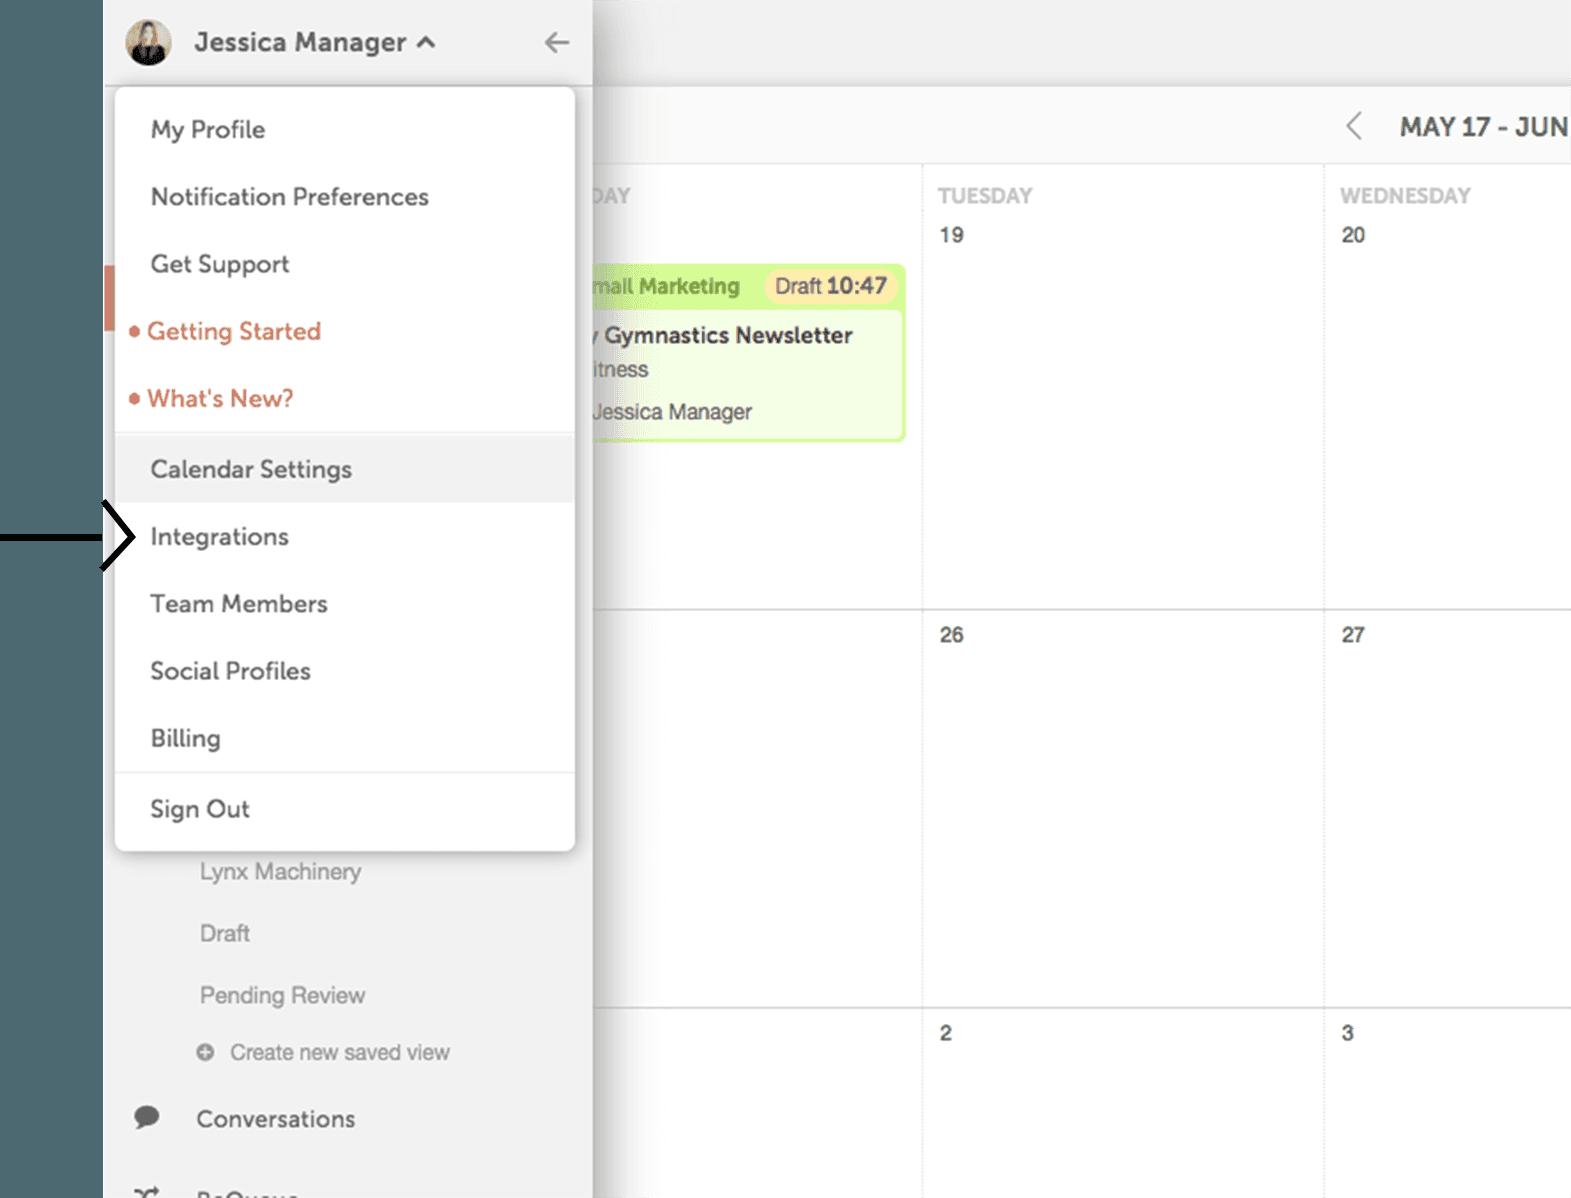 Integrations in calendar settings